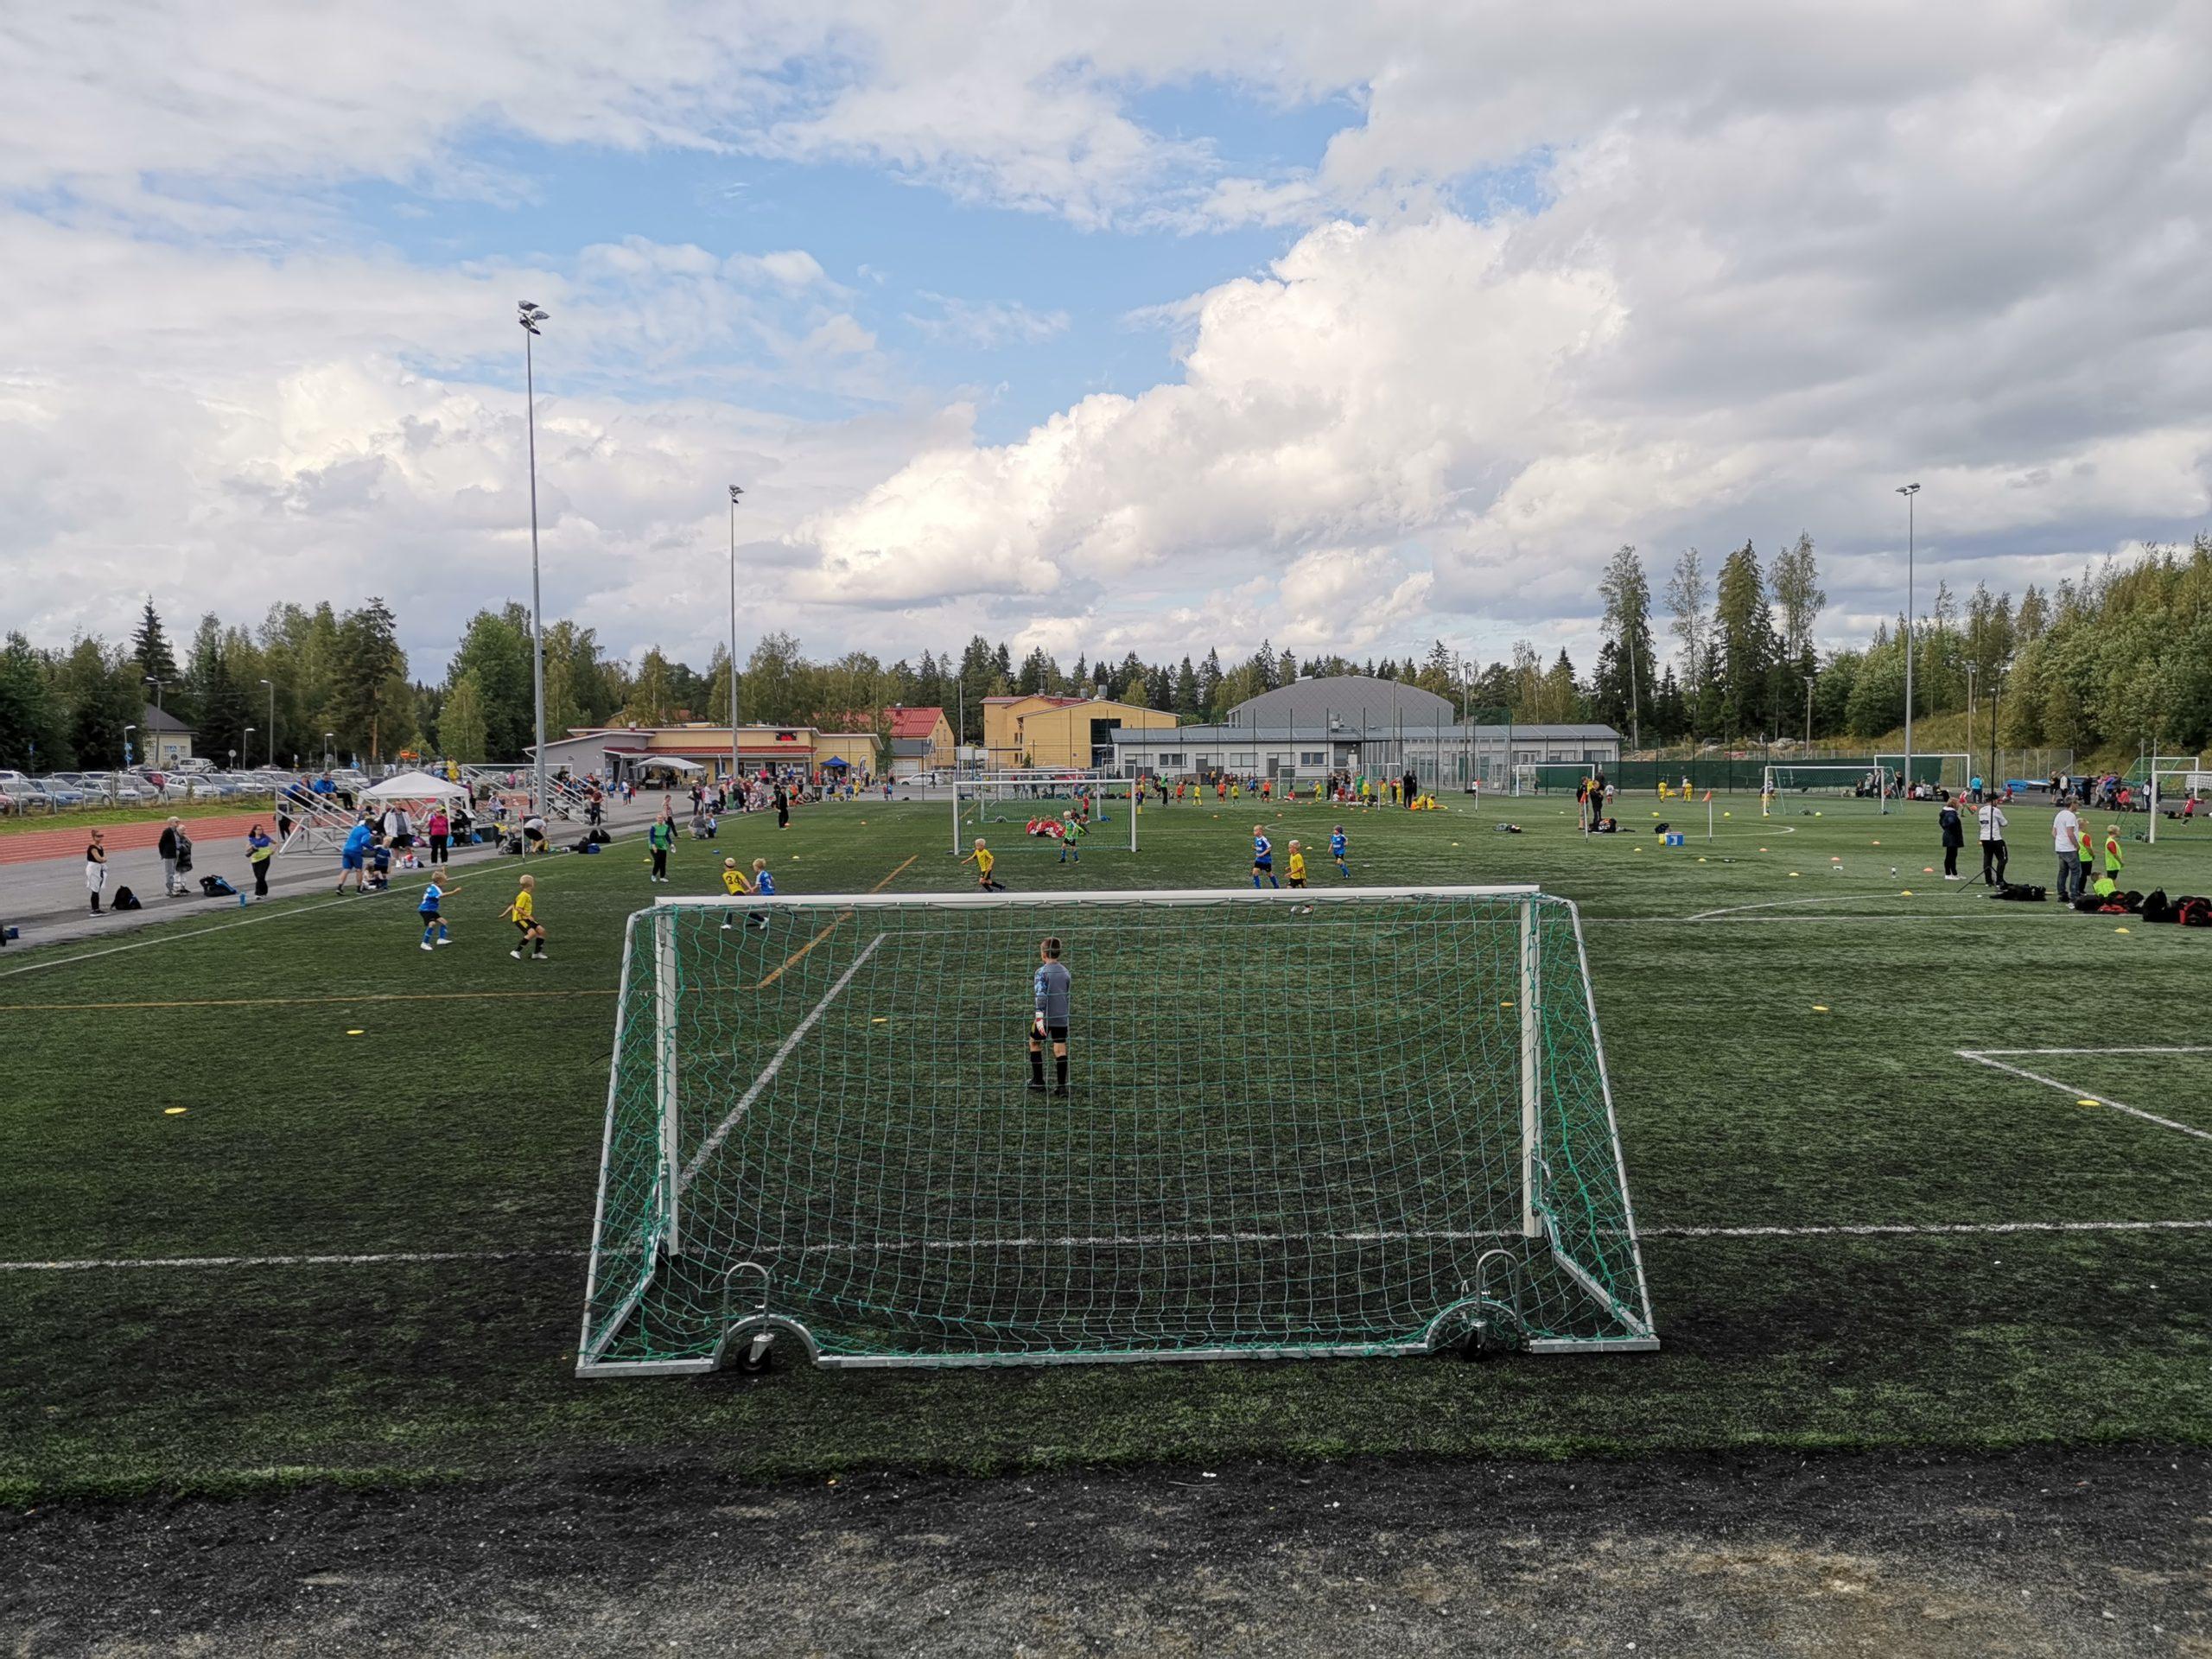 LeKi-futis Sääksjärven tekonurmi